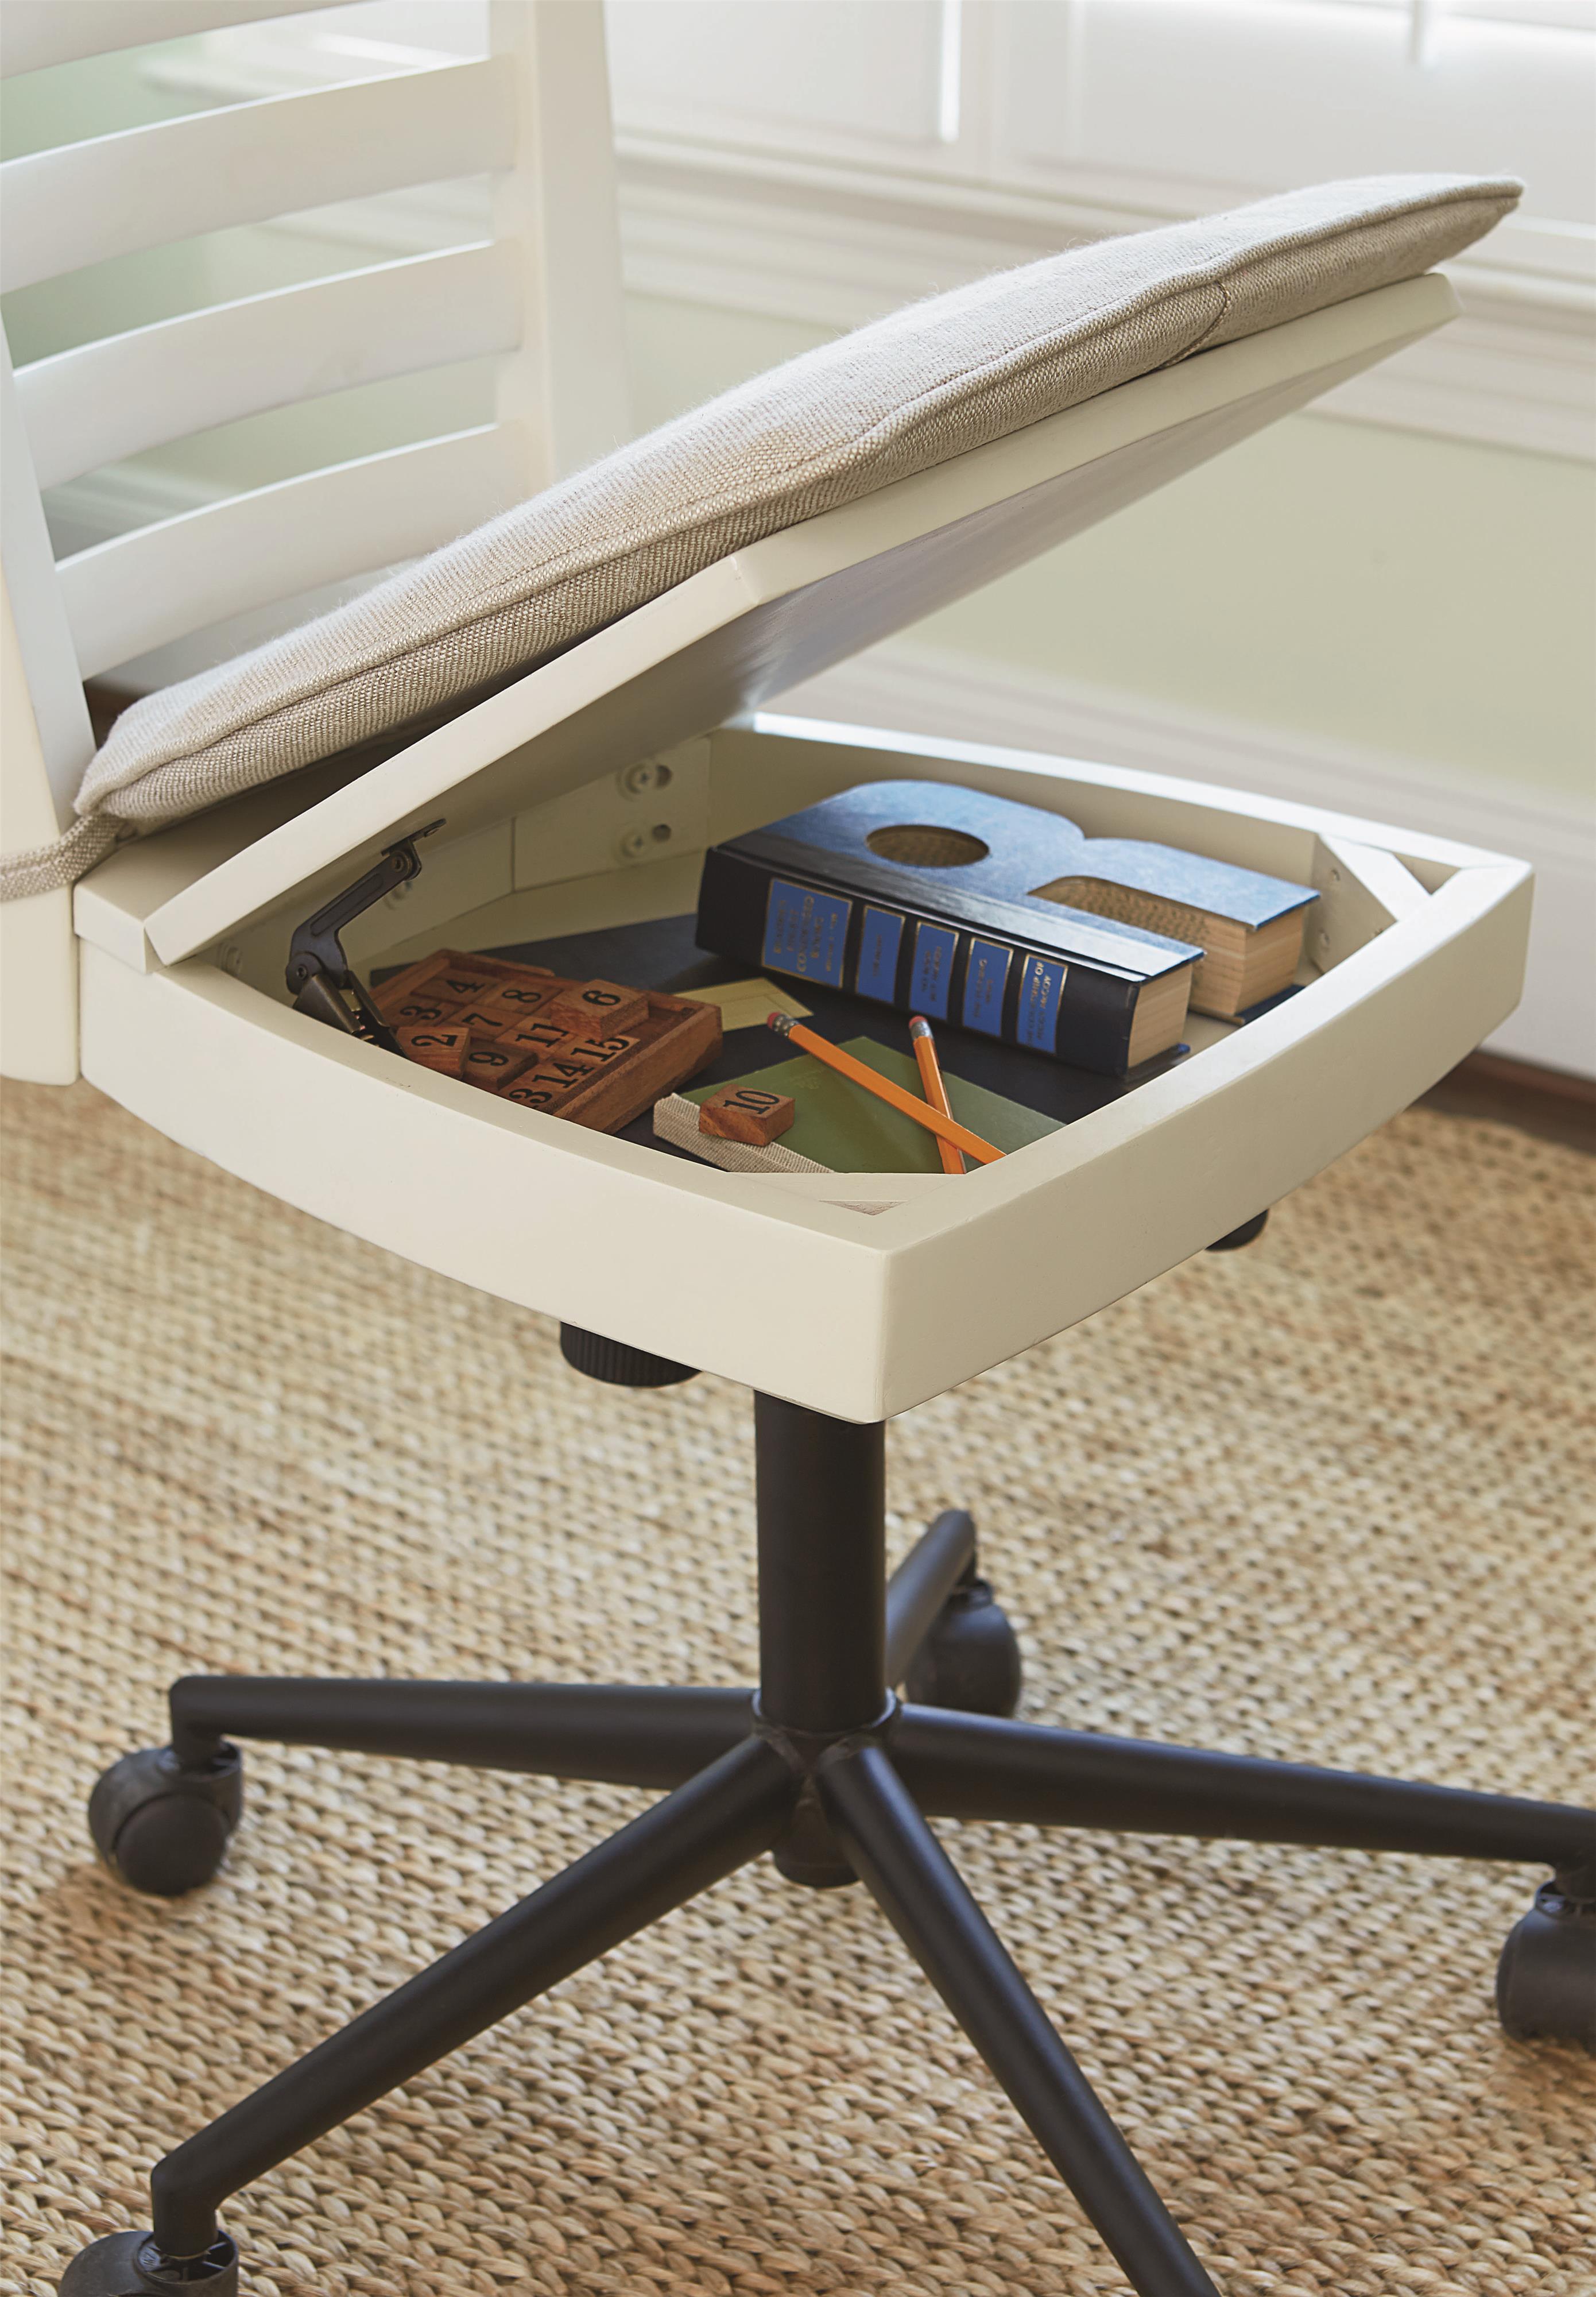 Smartstuff MyRoom Swivel Desk Chair With Lift Lid Seat